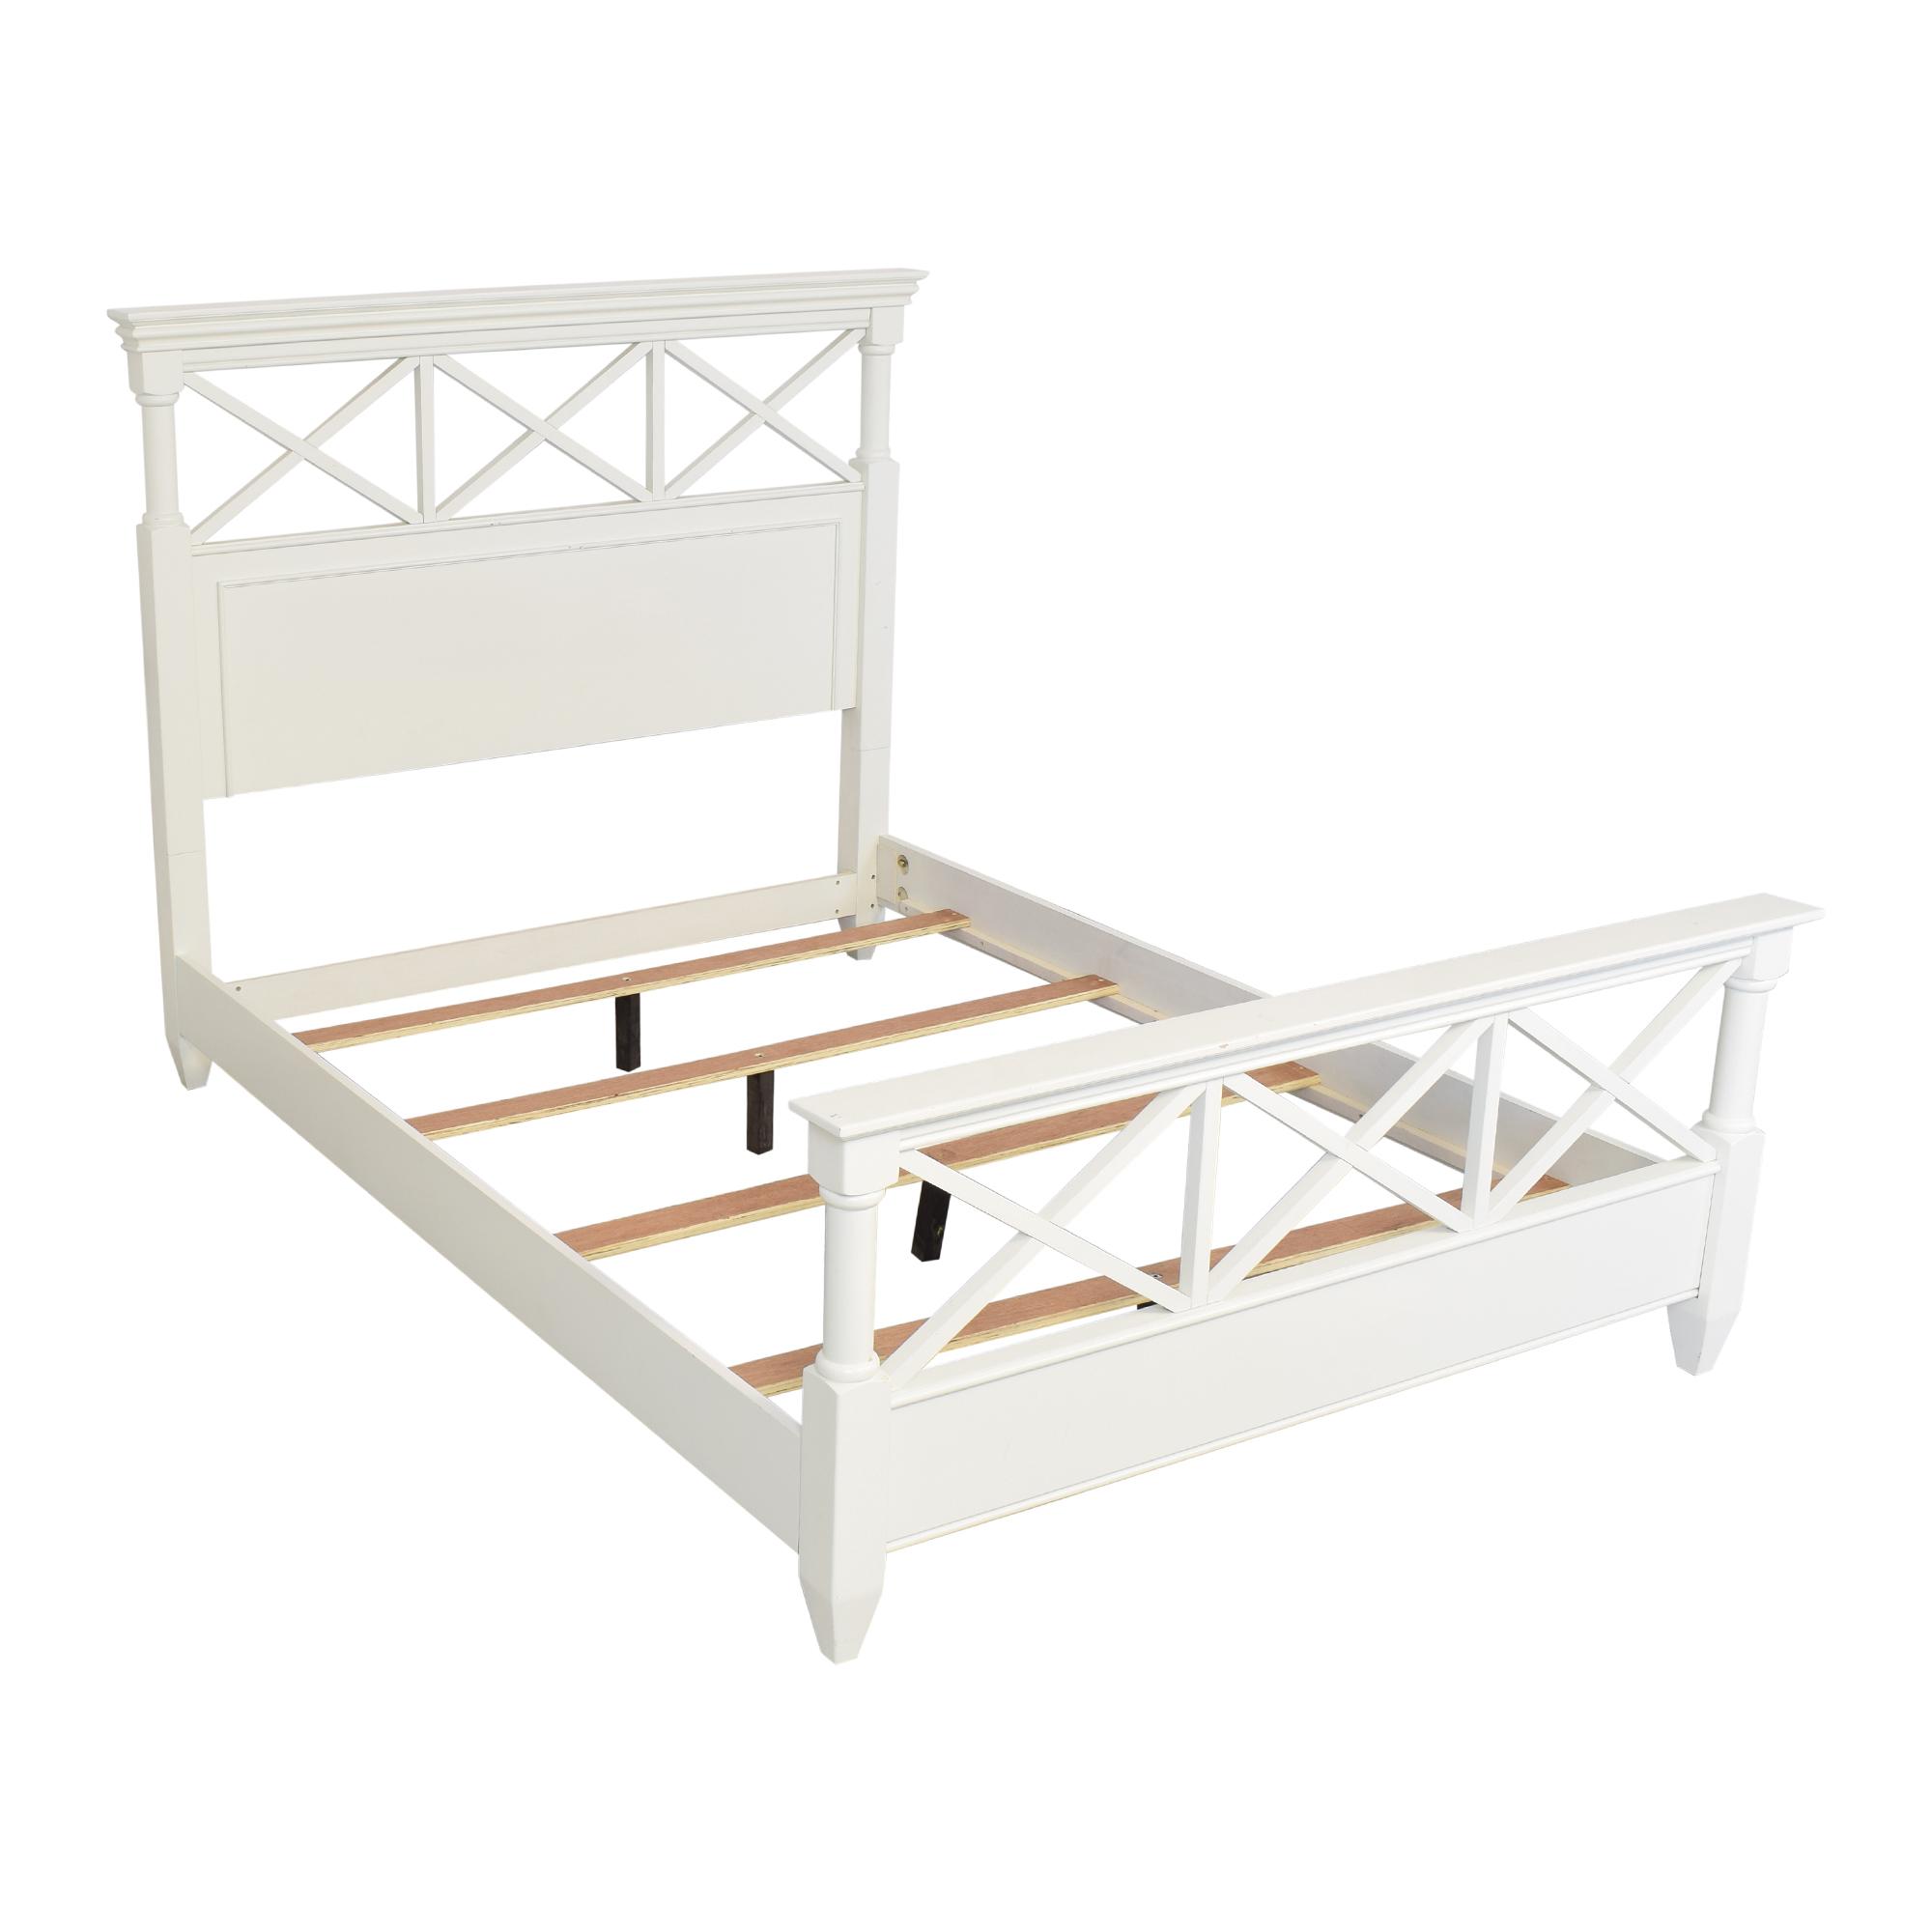 Magnussen Home Magnussen Home Queen Bed Frame ma